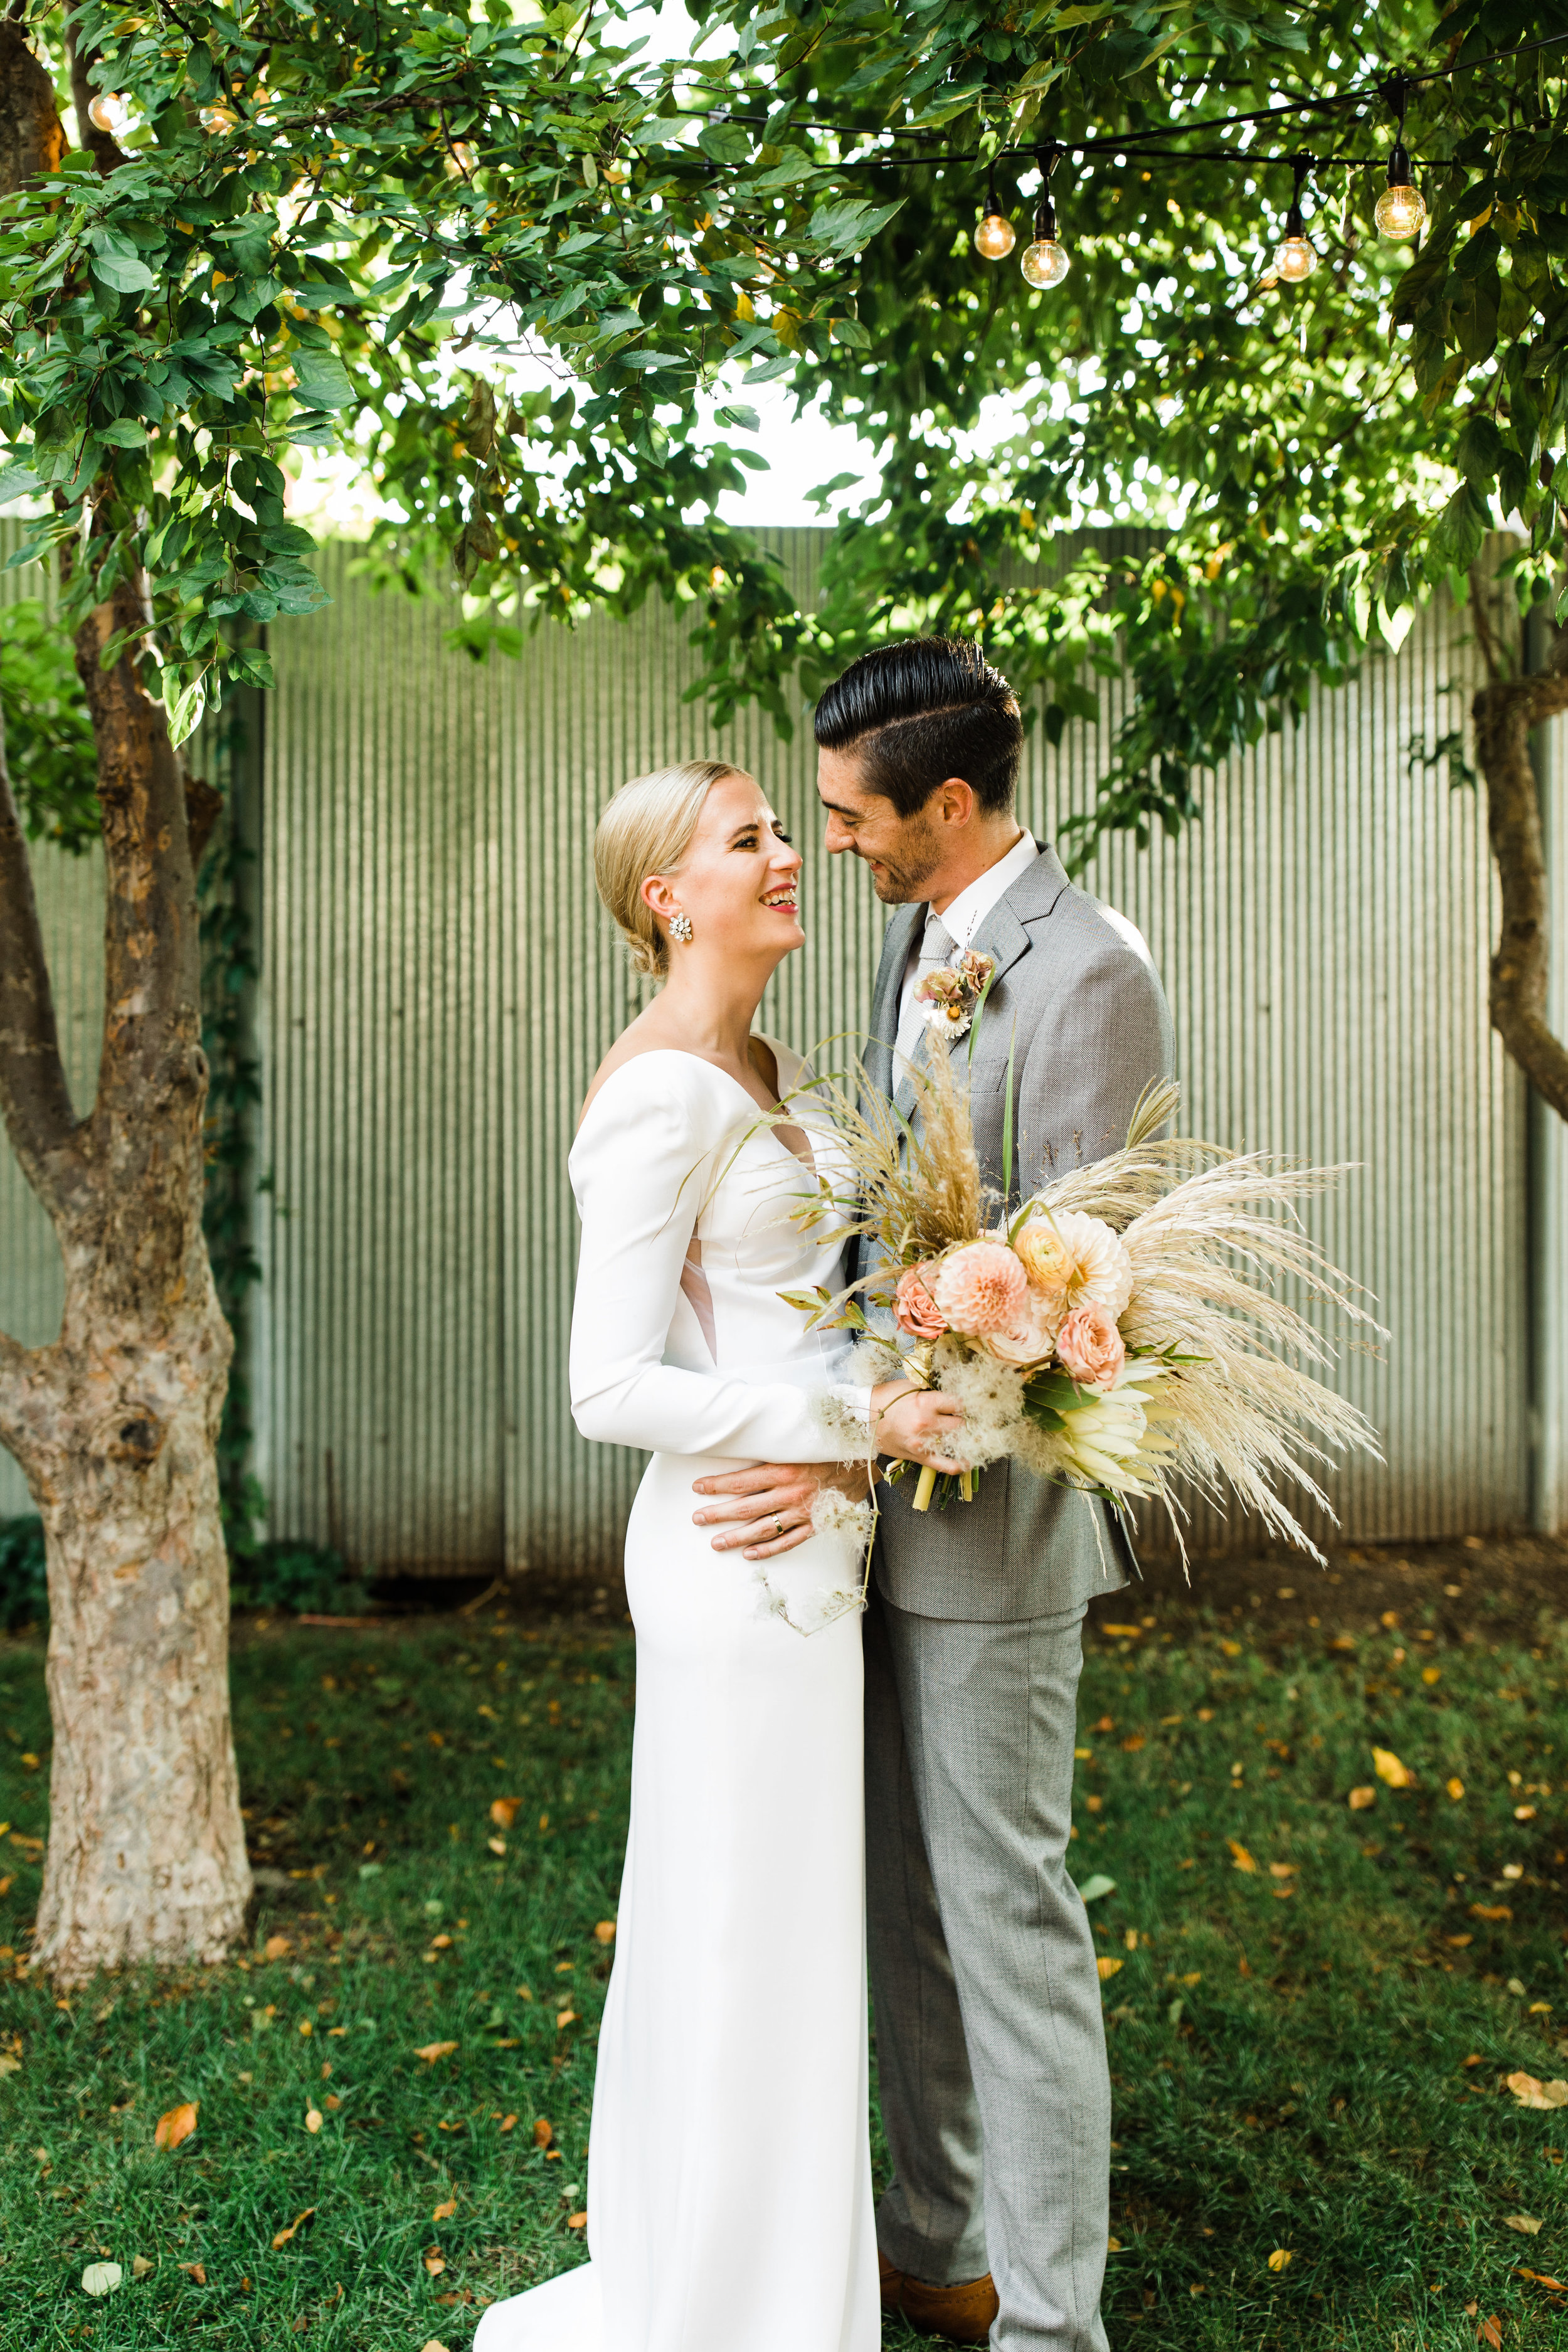 amykyle-wedding-9953-2.jpg